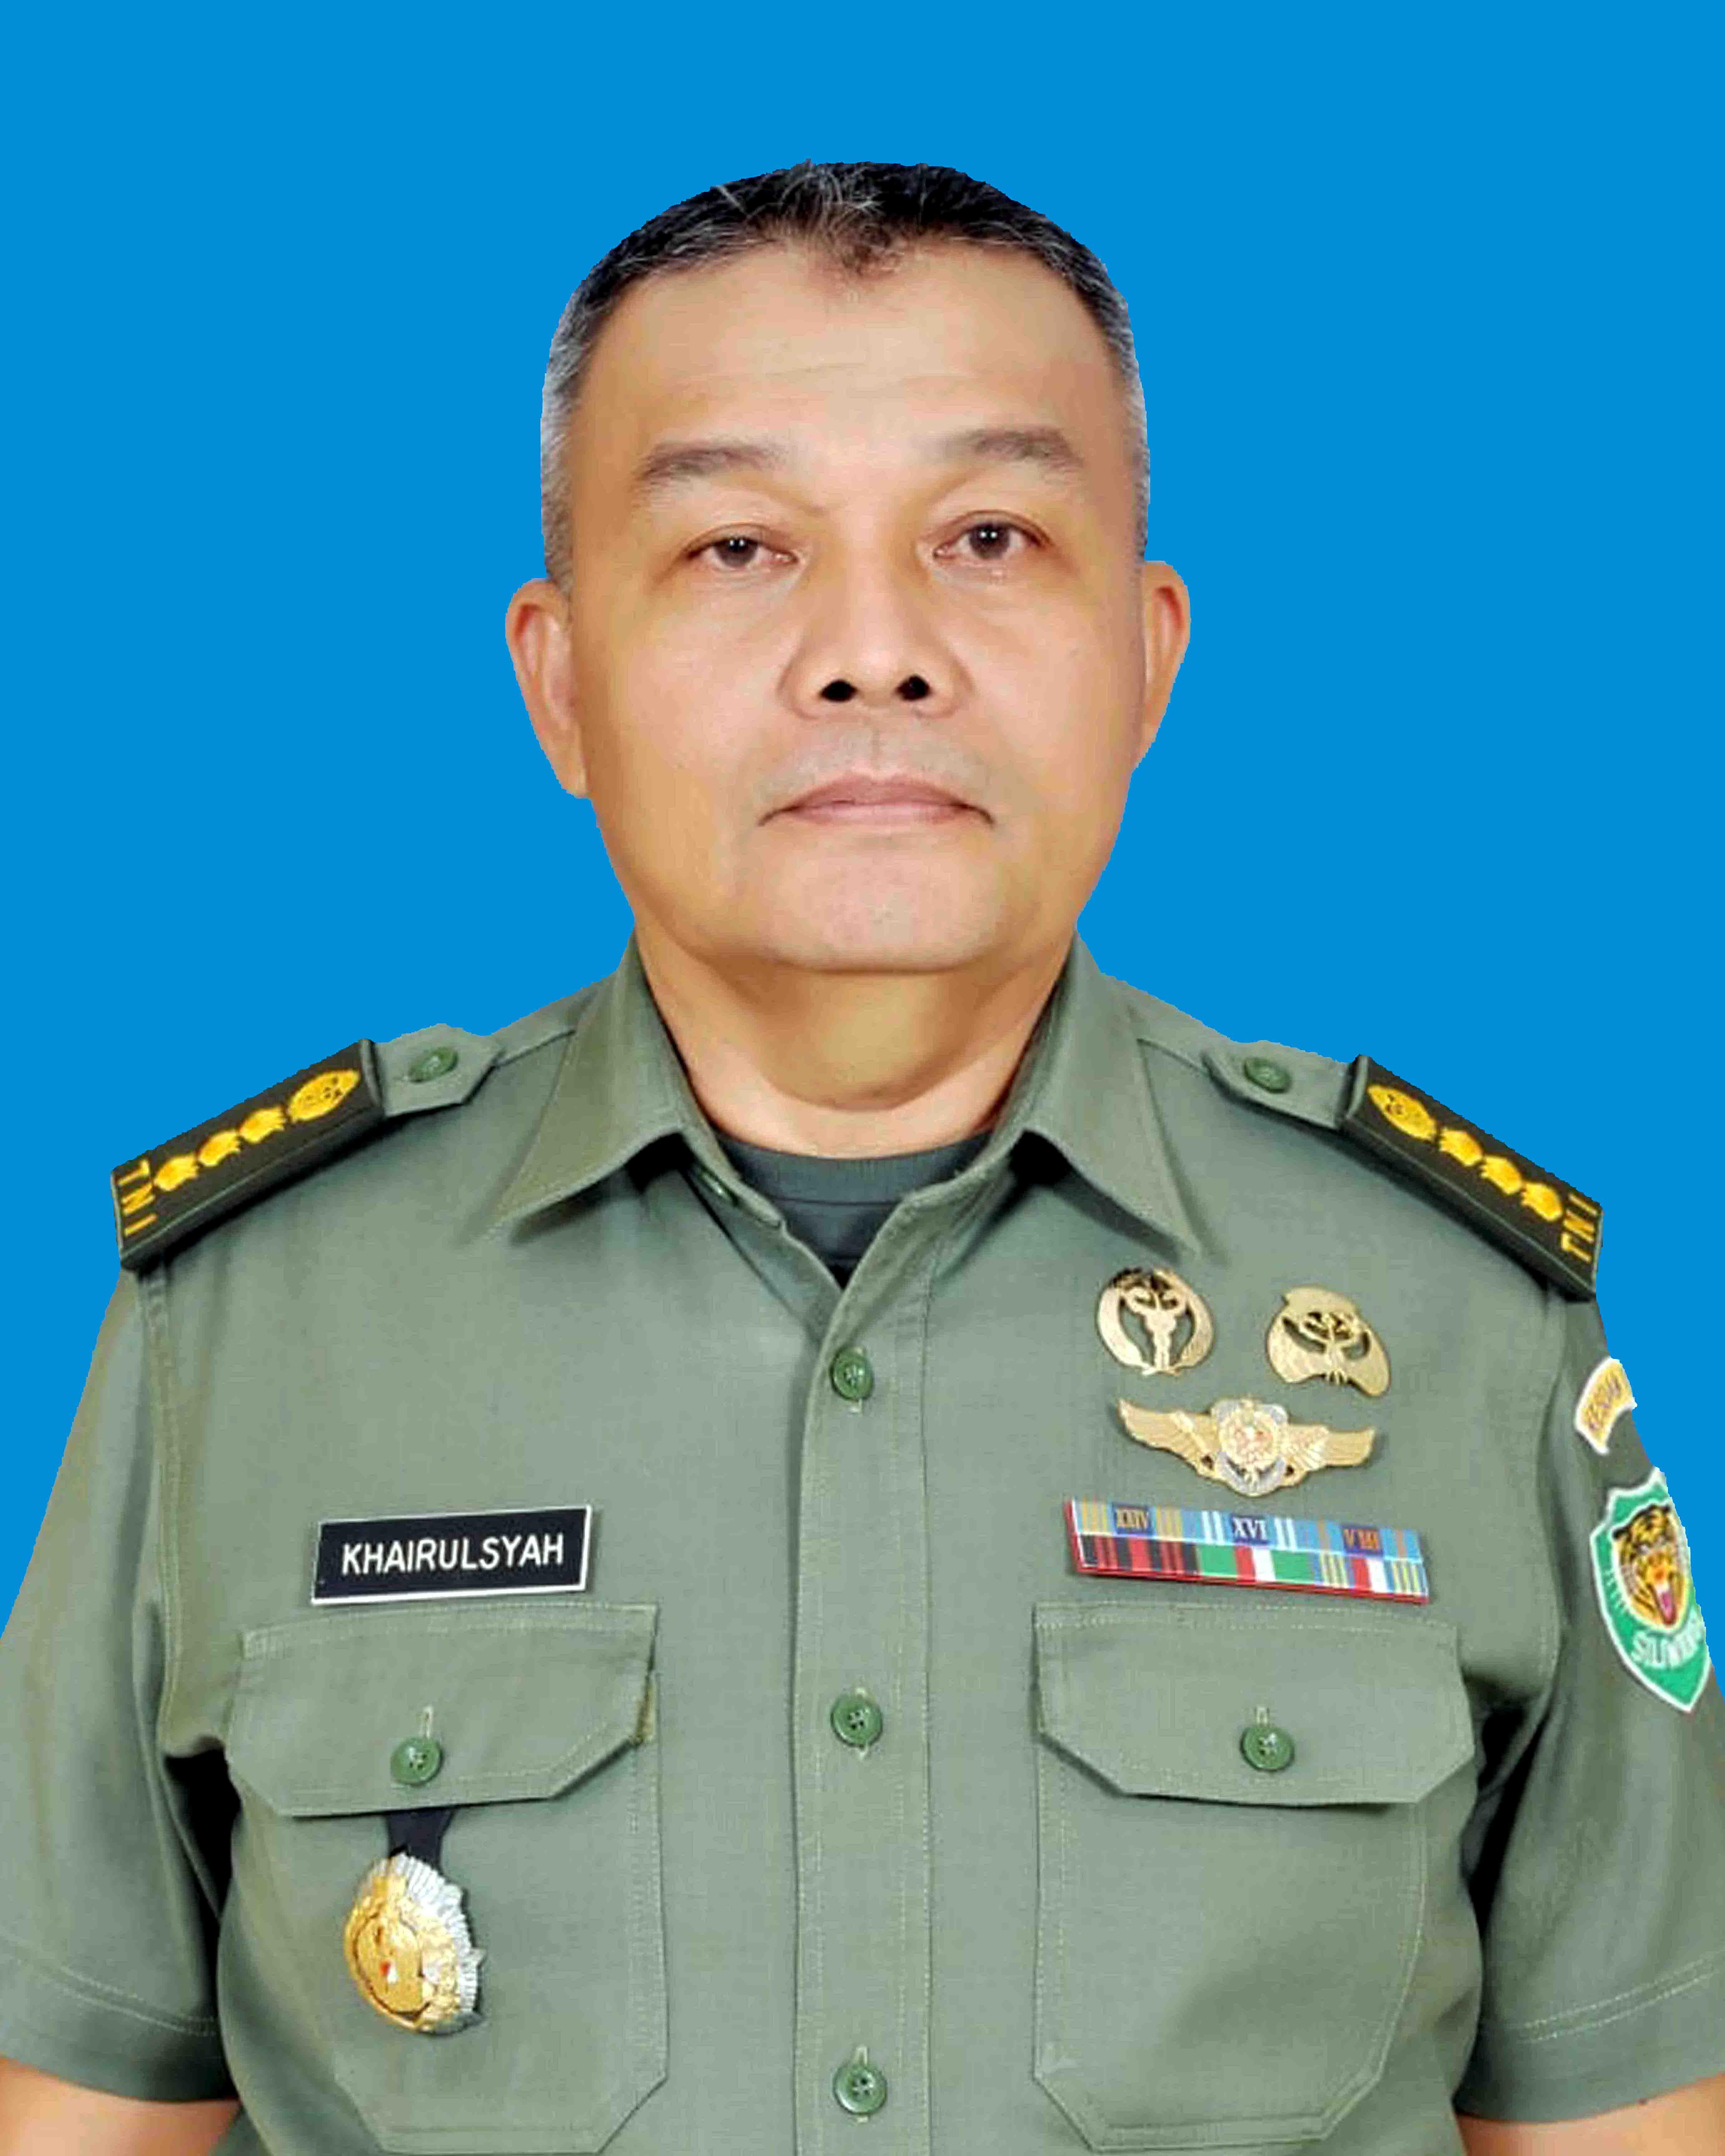 dr. Khairulsyah, M.A.R.S